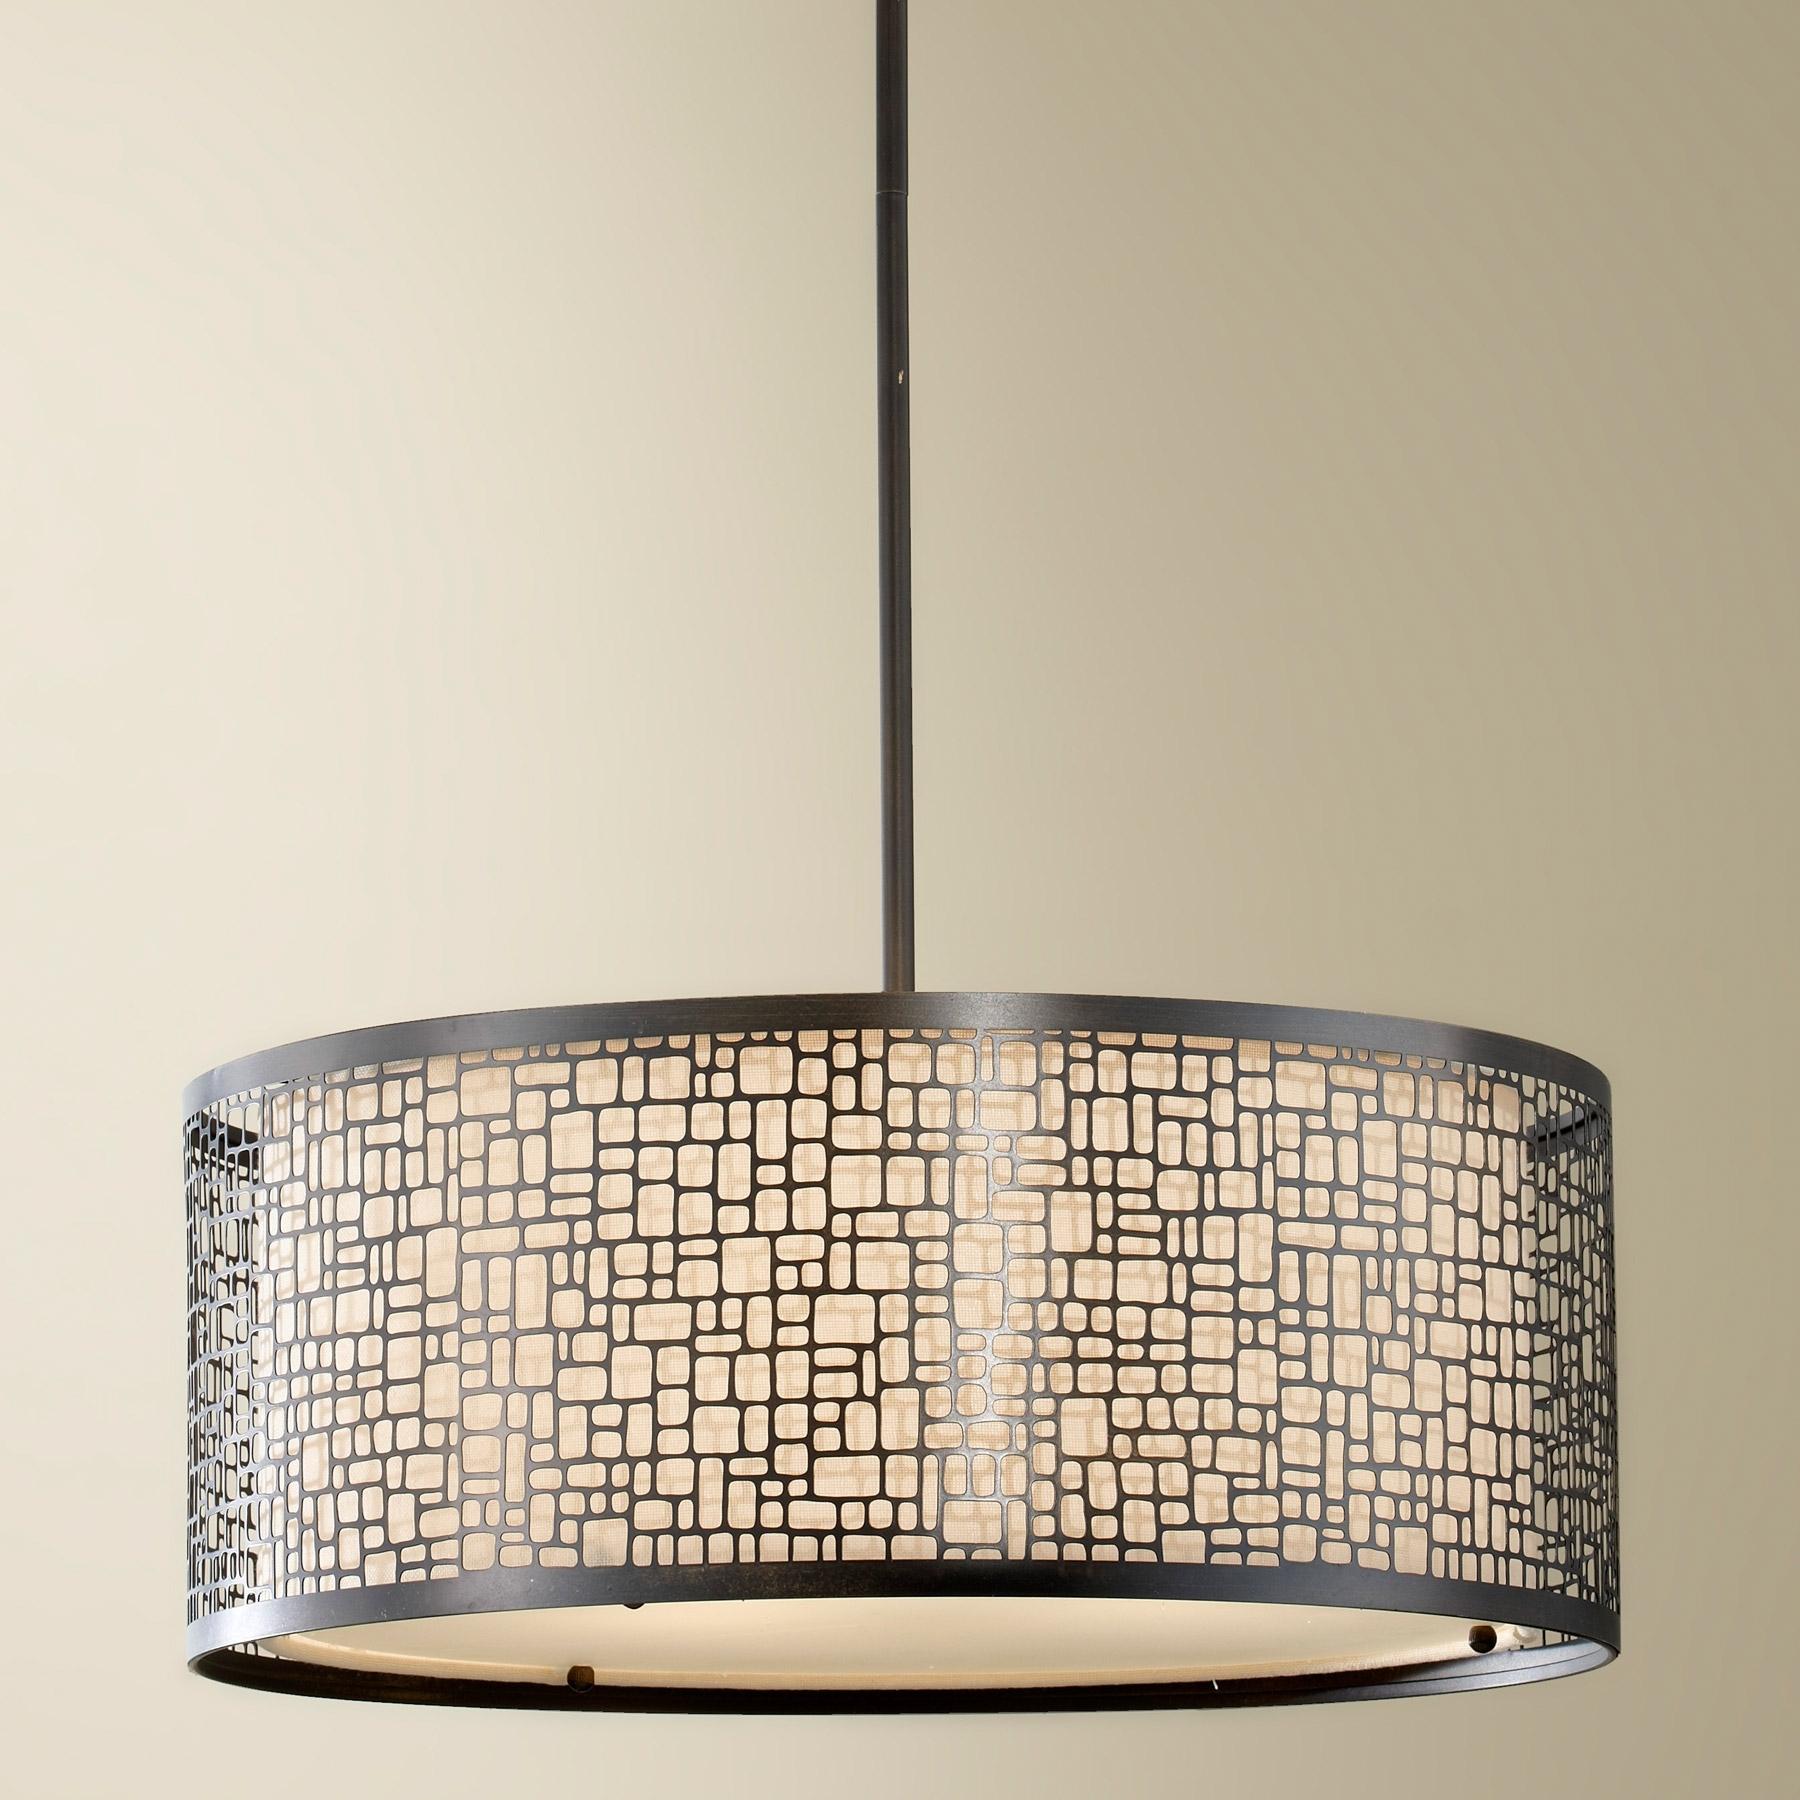 Commercial Led Pendant Lights Modern Ceiling Lights Contemporary With Modern Pendant Lighting Fixtures (#3 of 15)